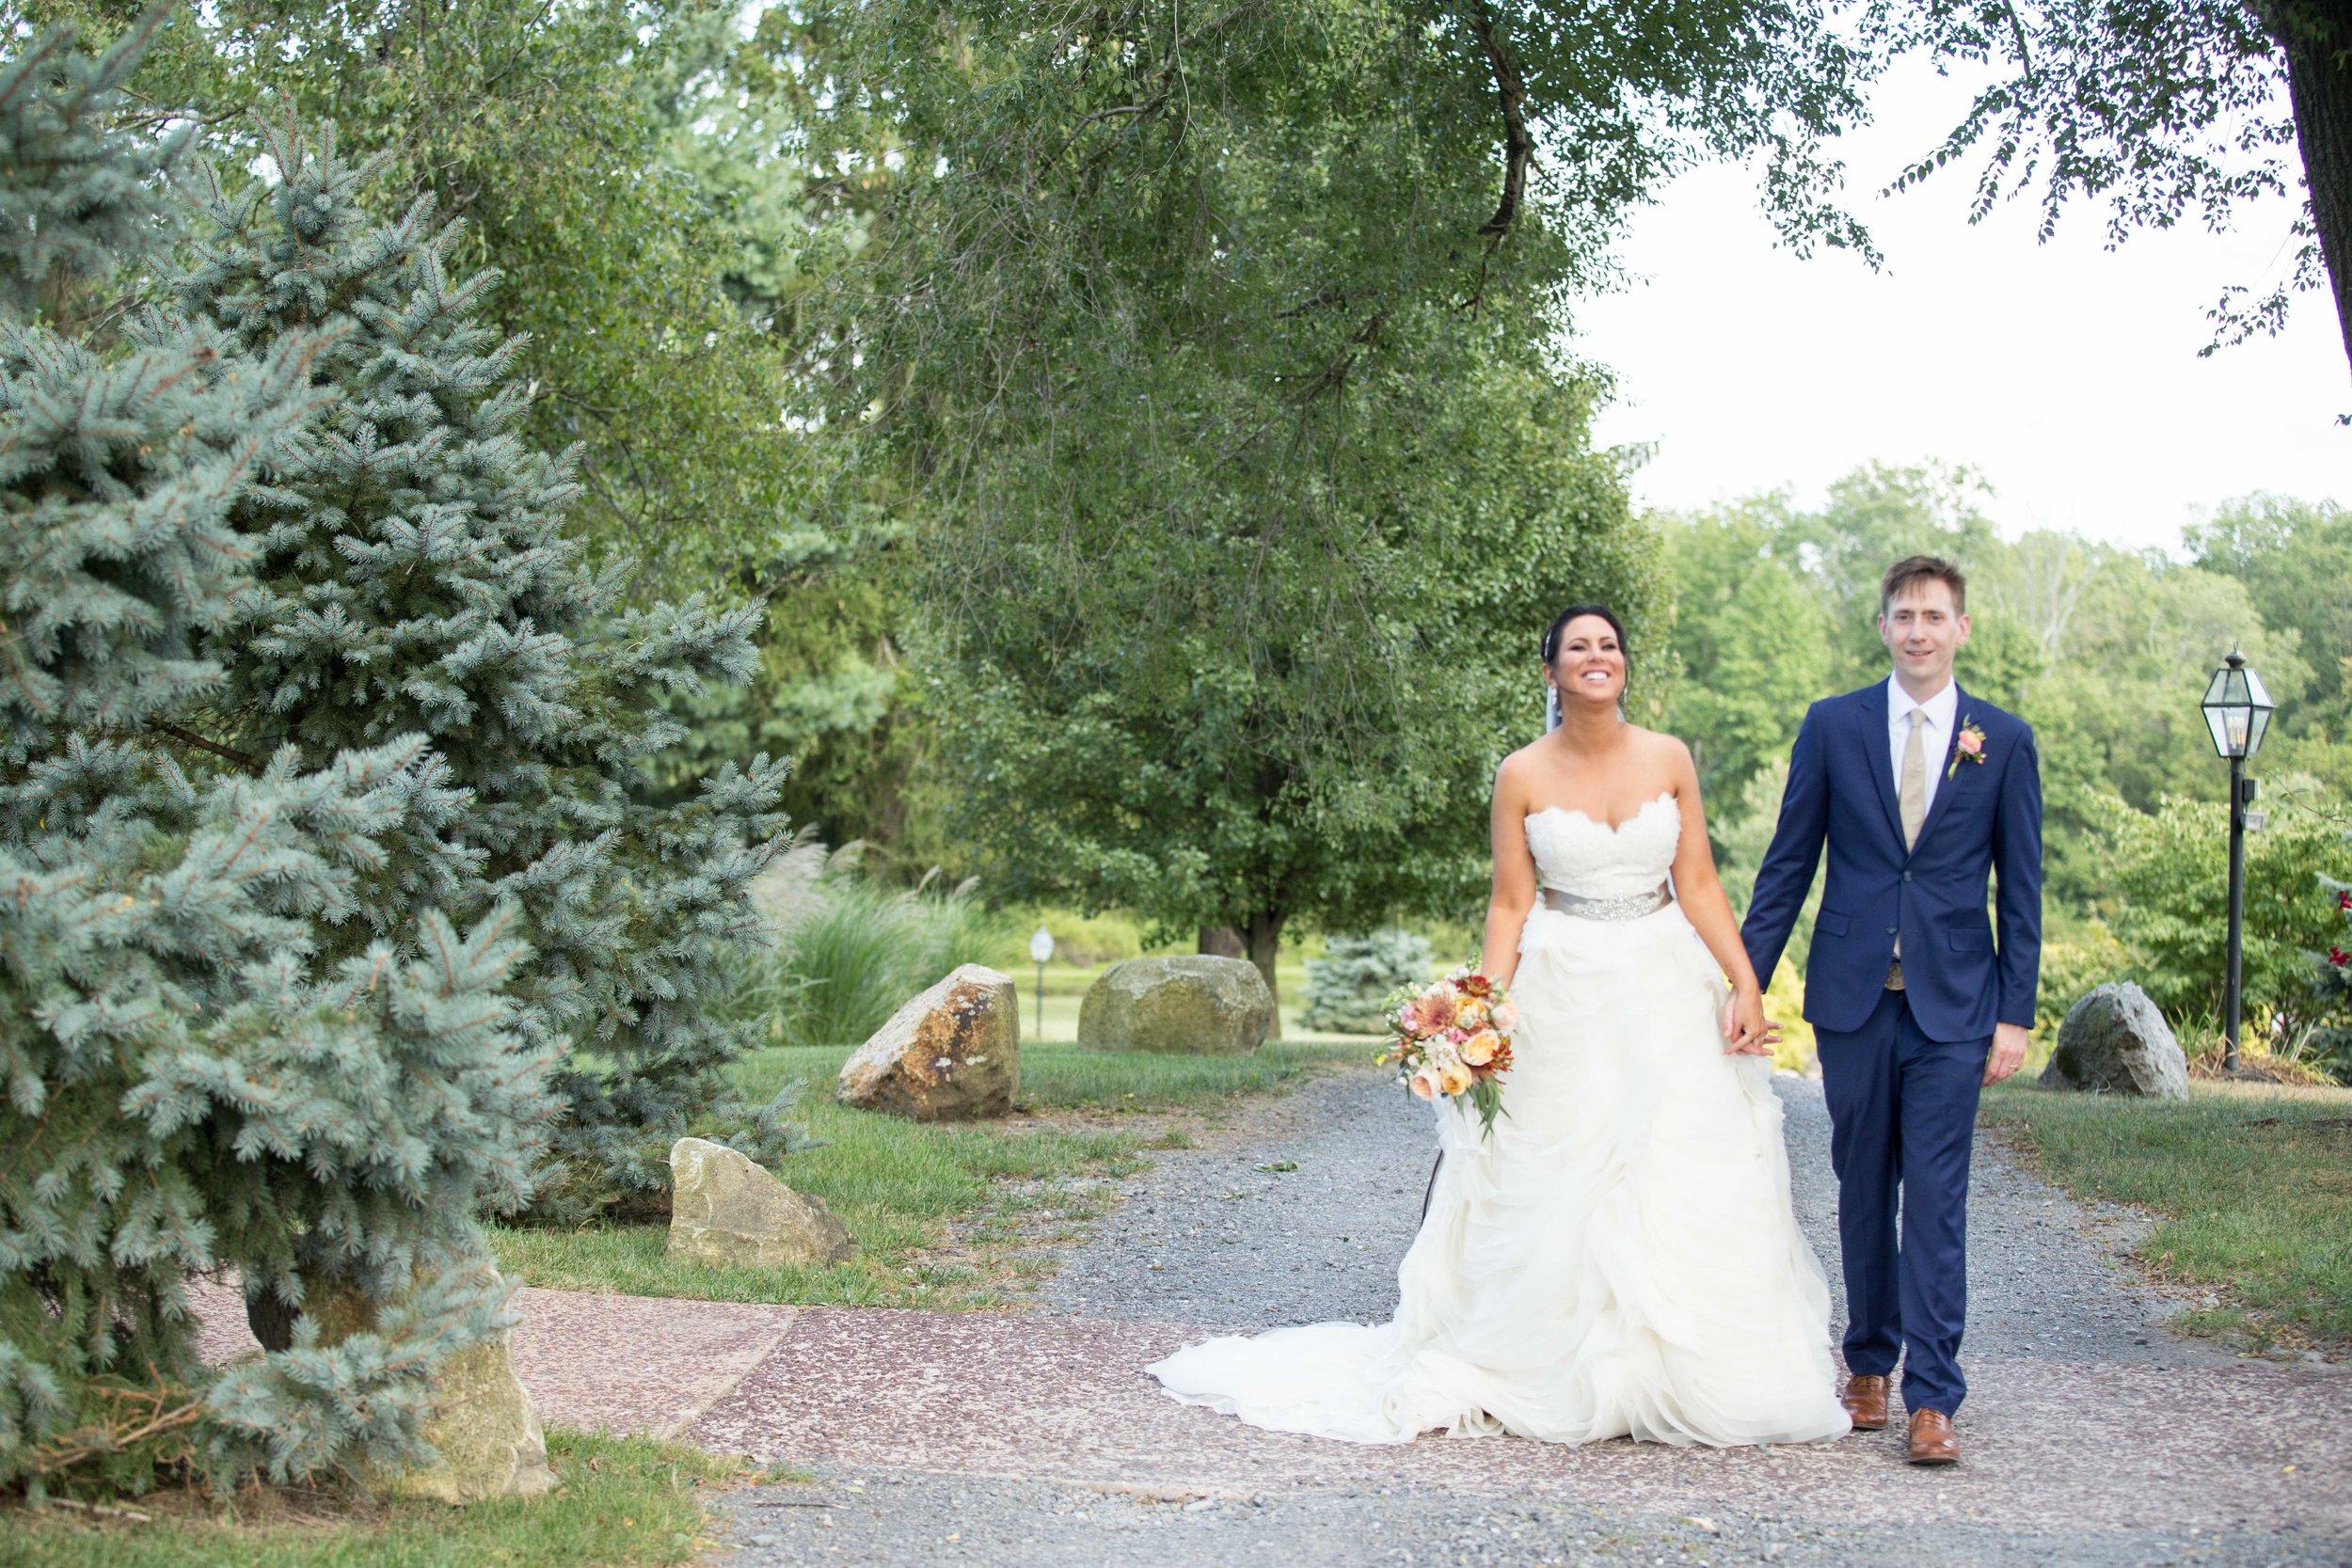 Philadelphia-Wedding-Planner-Heart-And-Dash-NicoleConnor-DrewNoelPhotography-1837.jpg